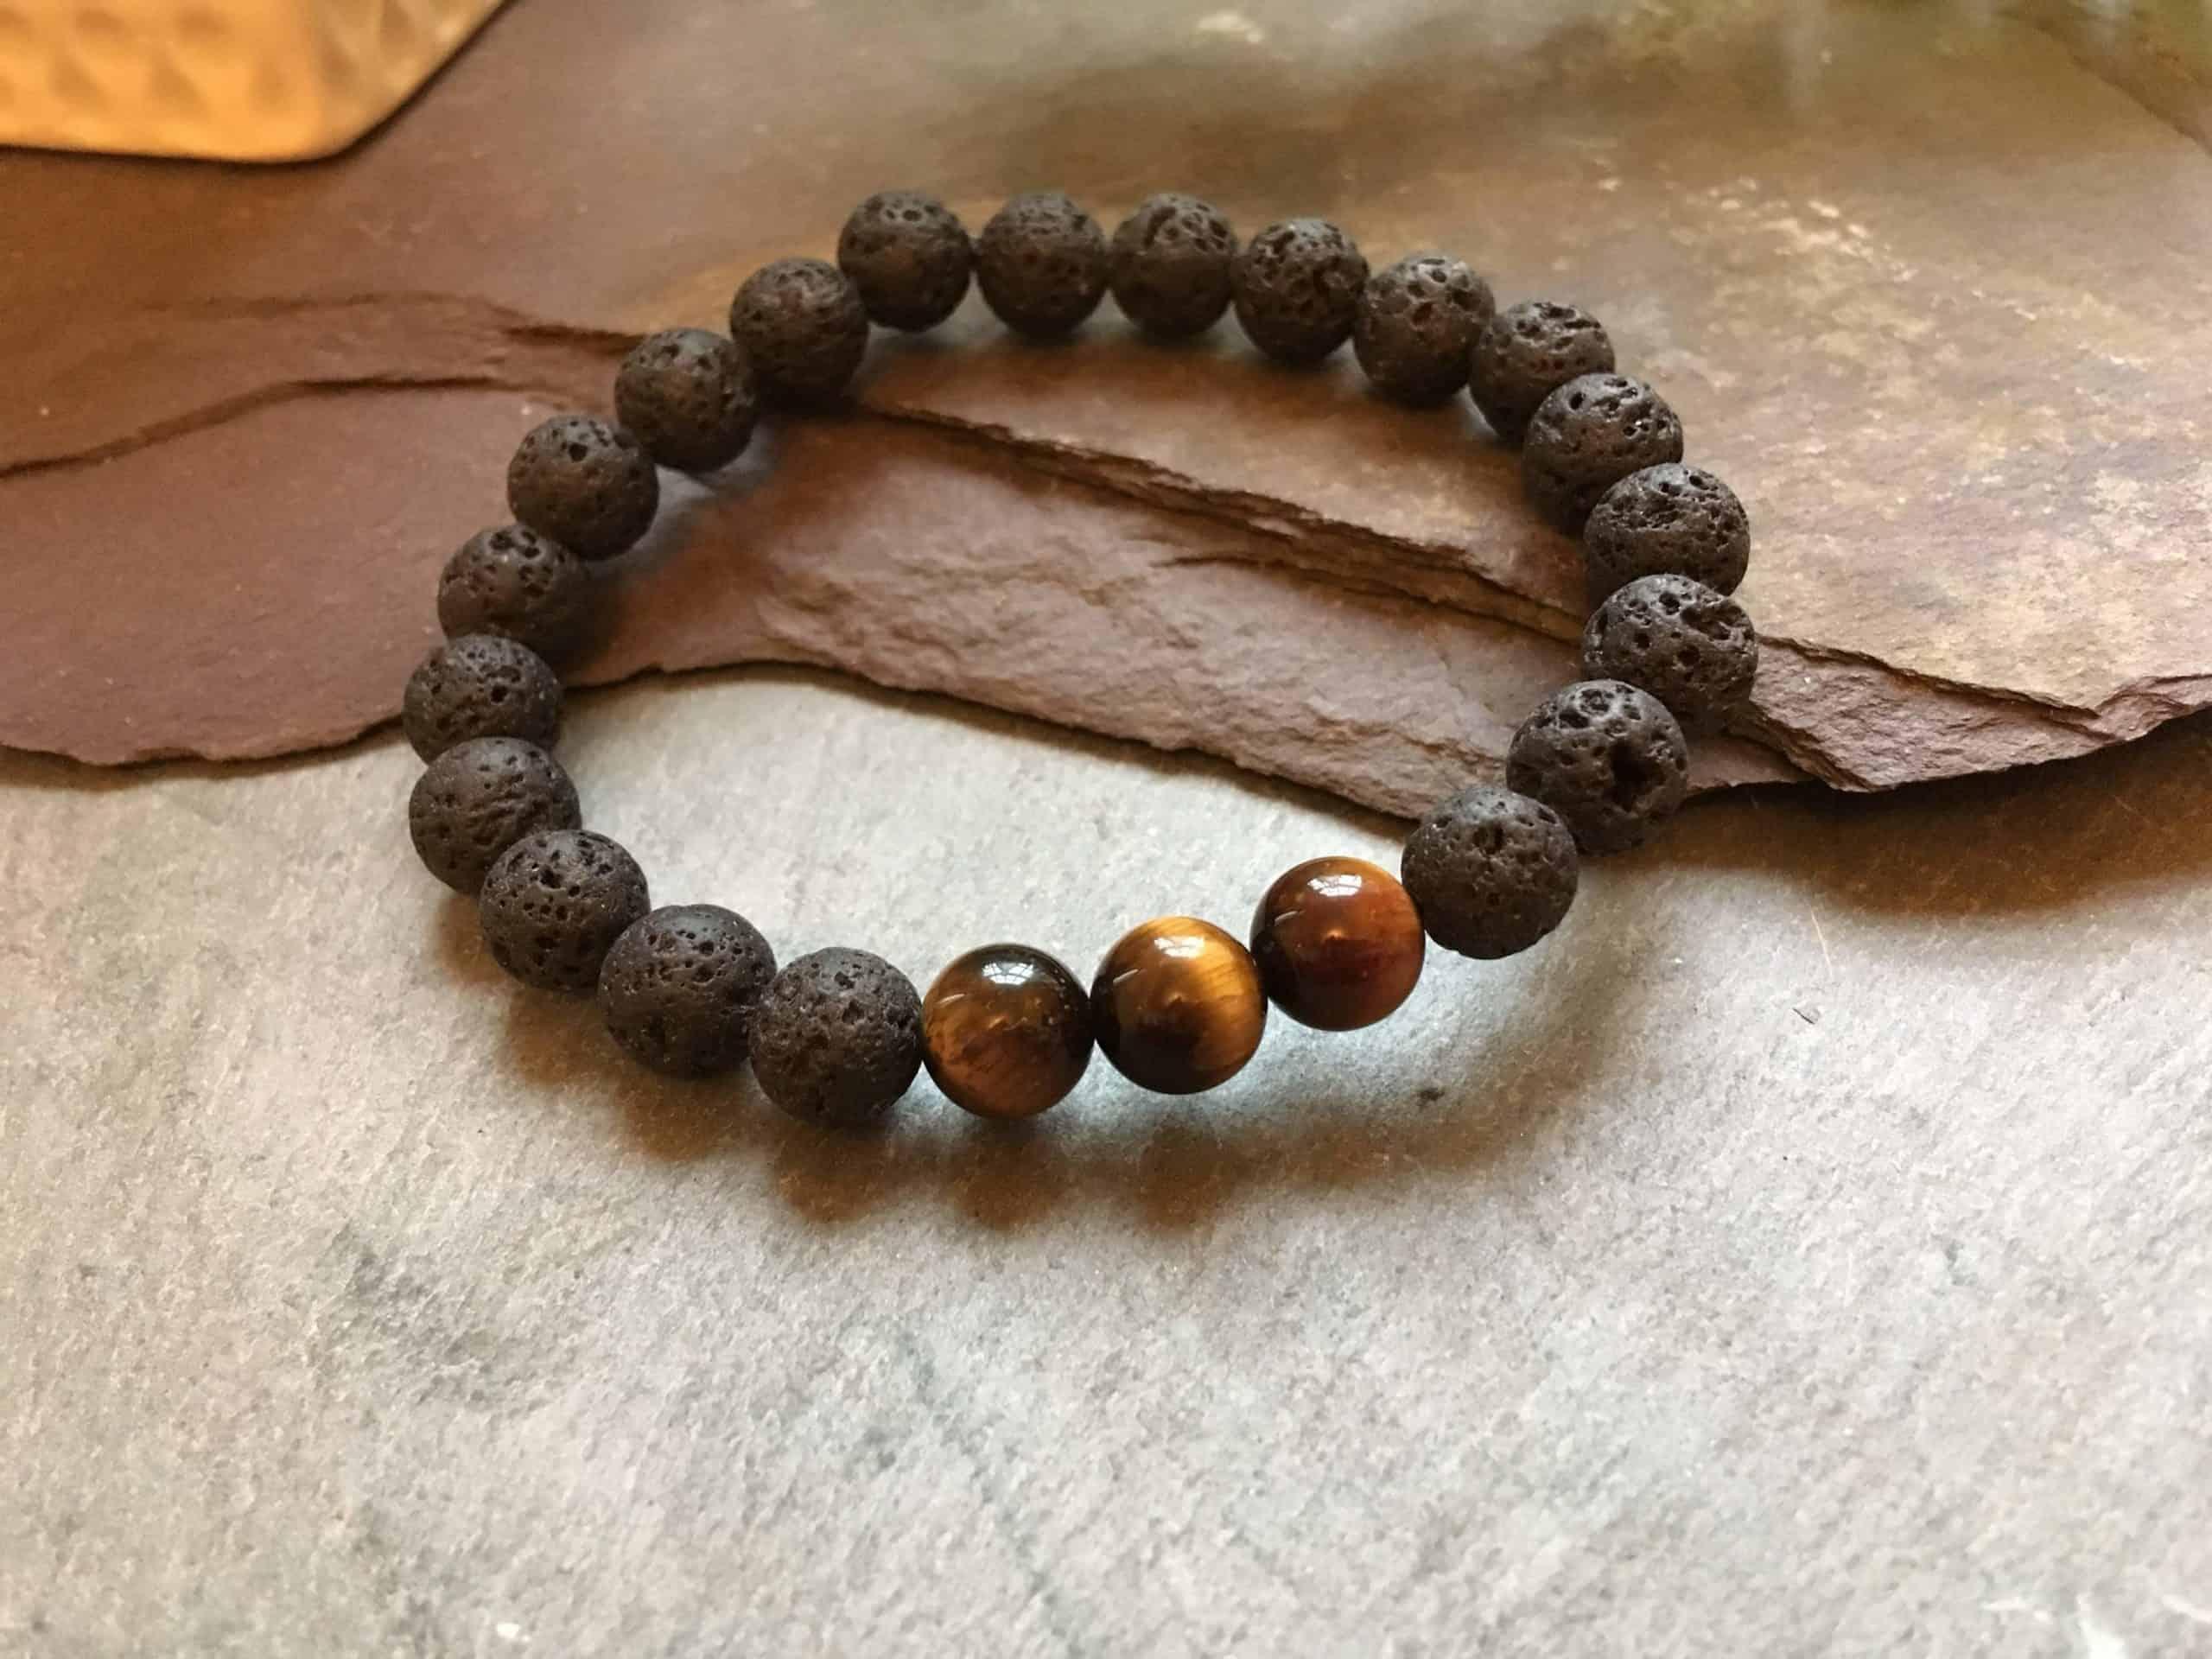 Lava Rock Stone and Tigers Eye Fashion Bracelet. Essential Oils Diffuser.